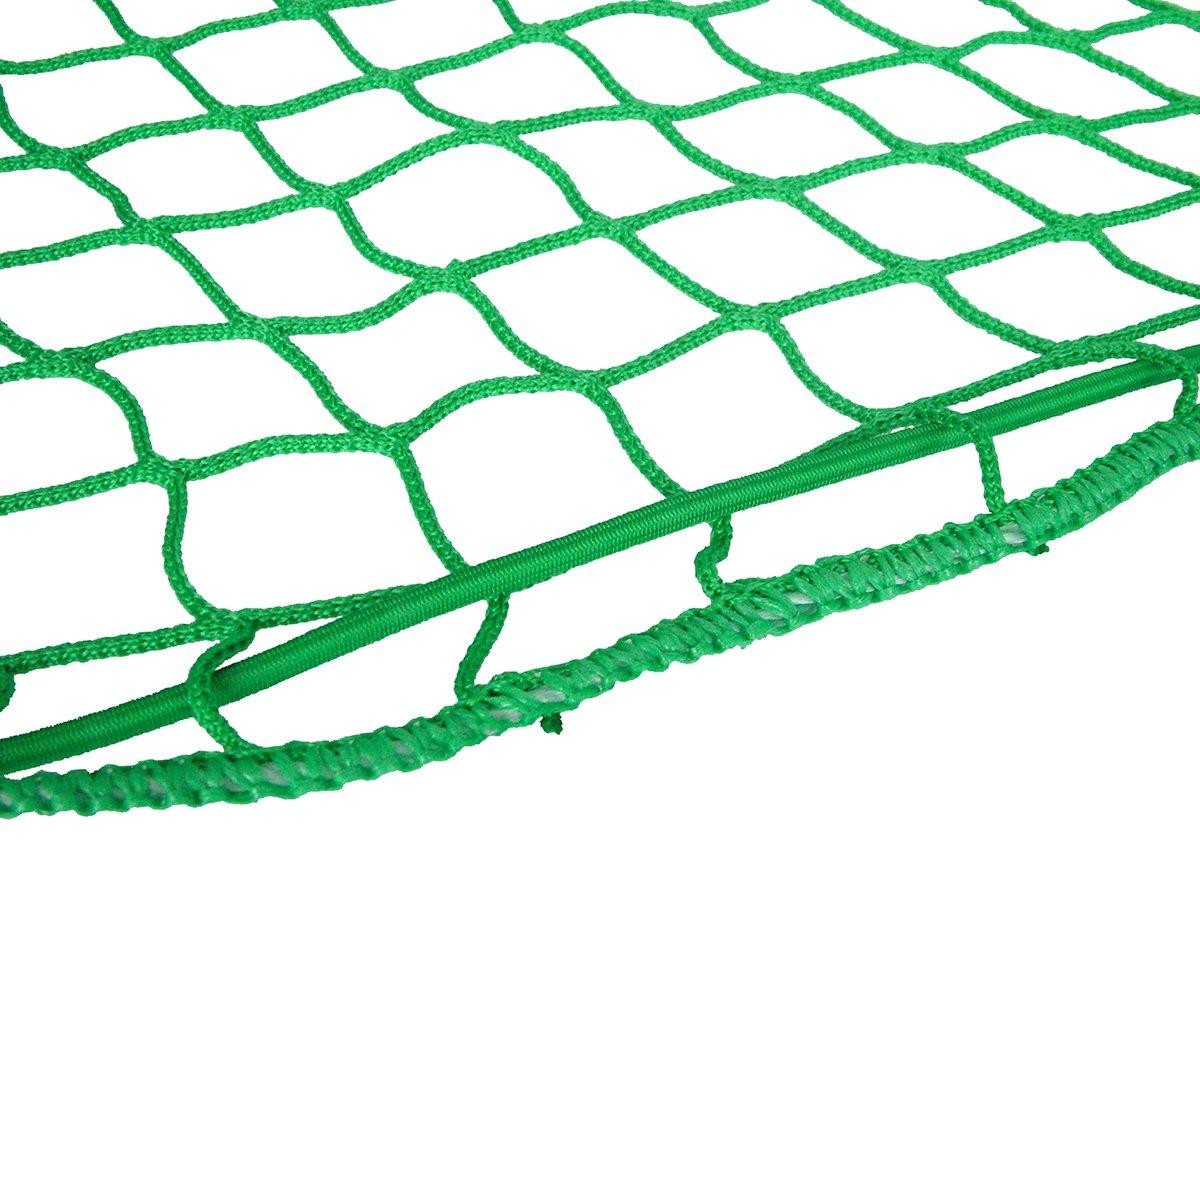 Pewag 88805 Protective Polypropylene Netting 1.25 x 2.10 m